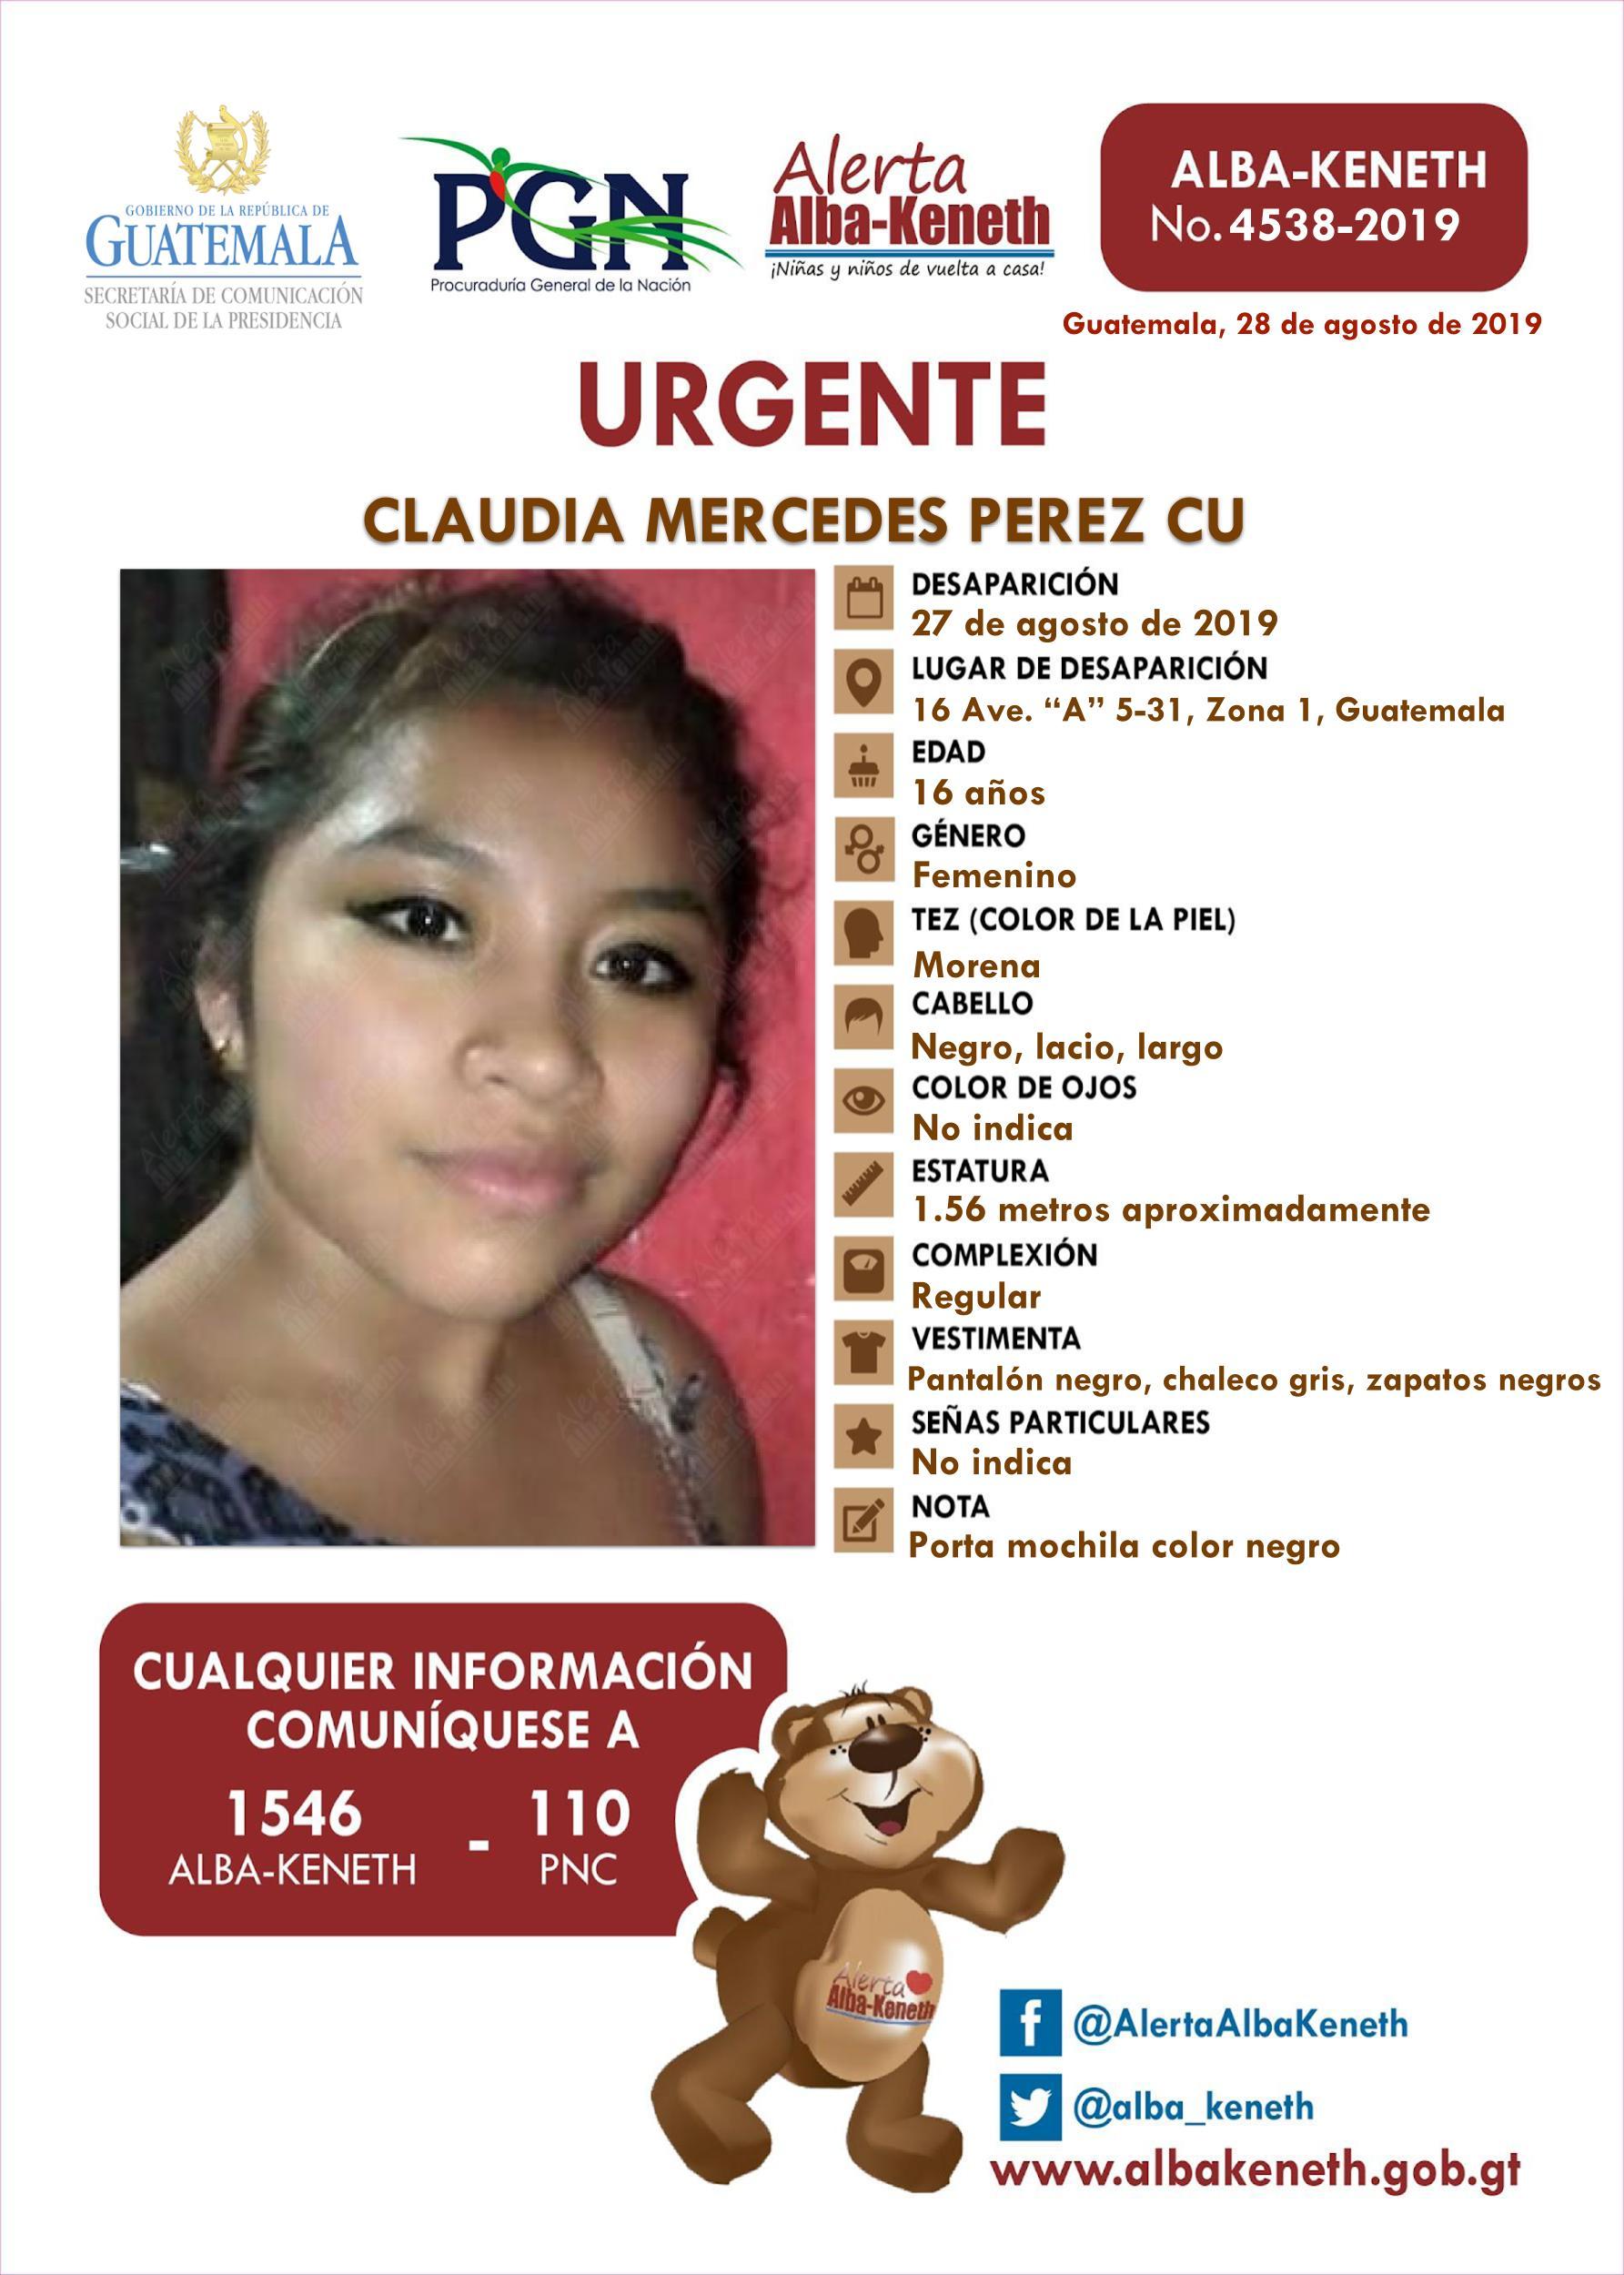 Claudia Mercedes Perez Cu